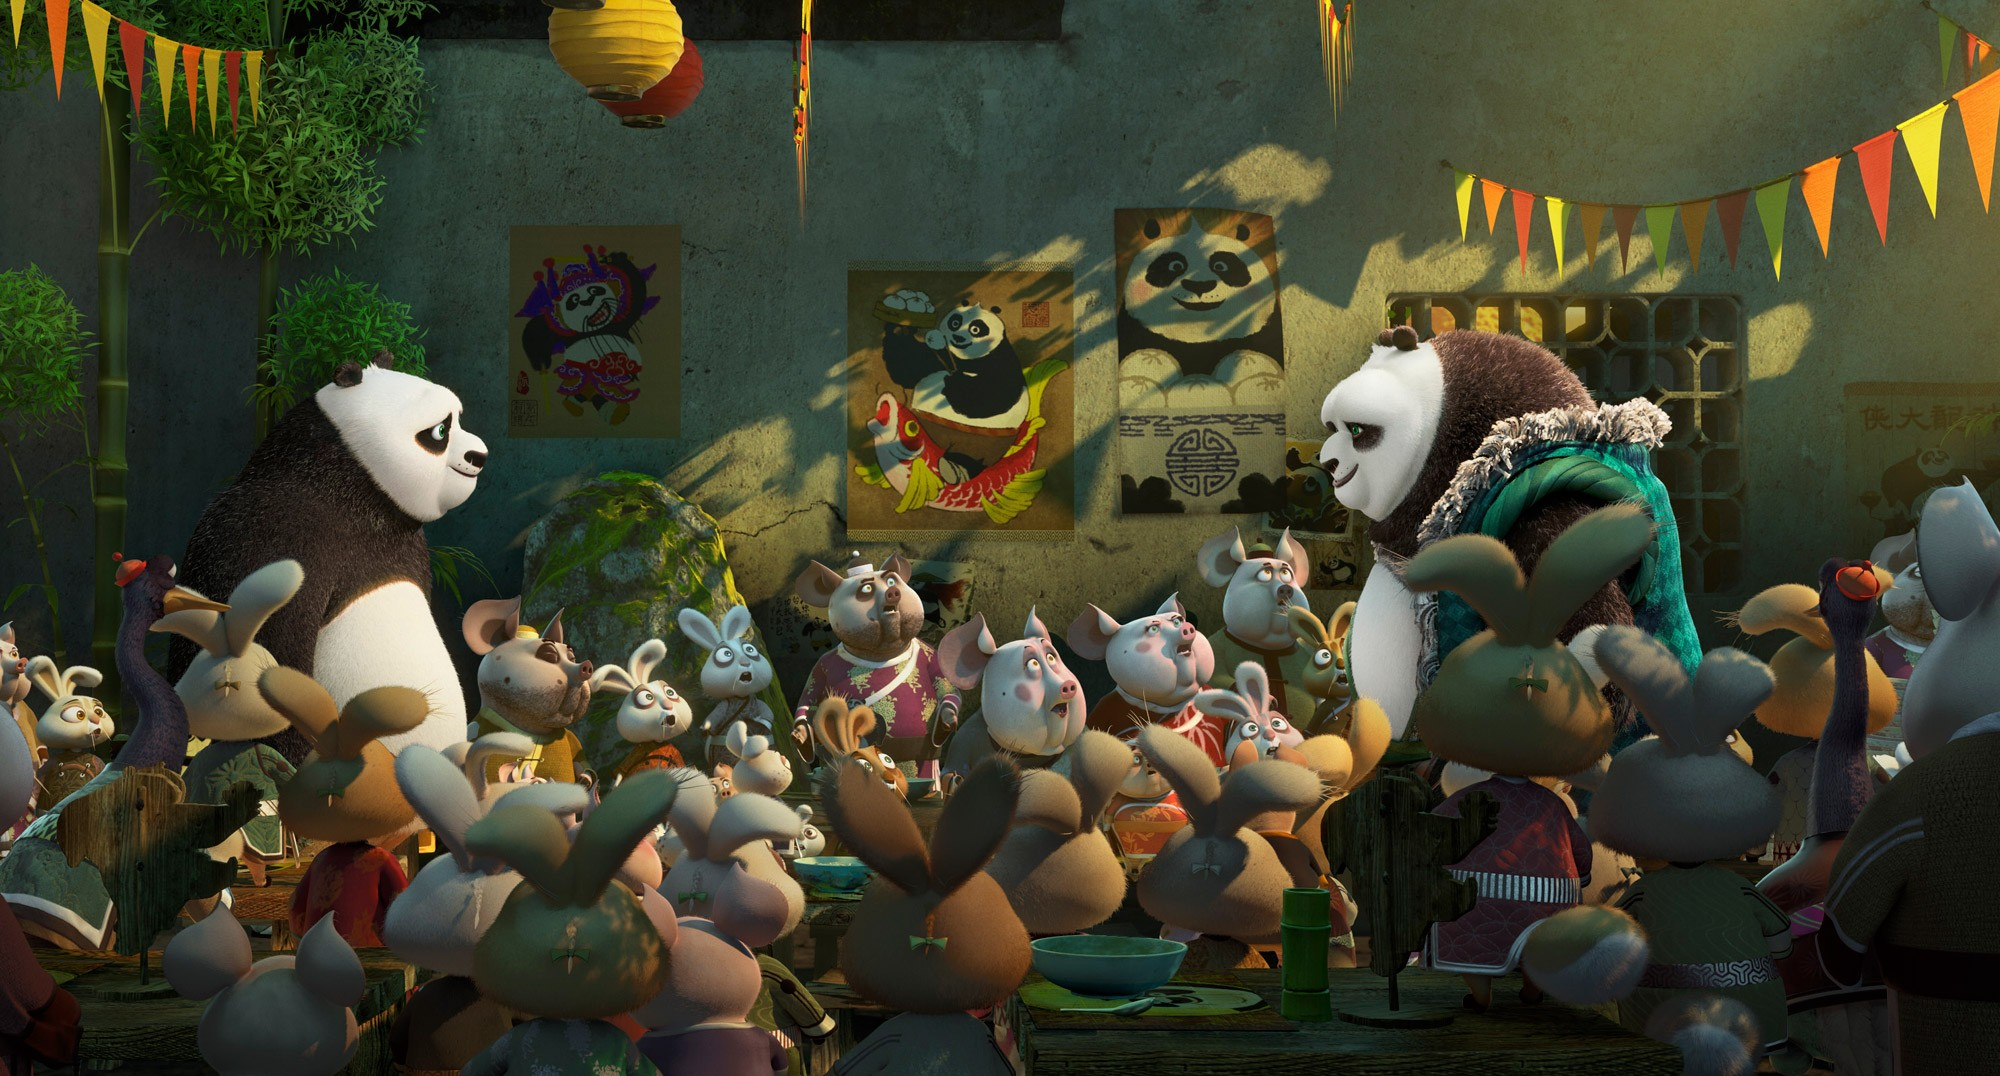 Kung-Fu-Panda-3-Movie-Review-Image-1